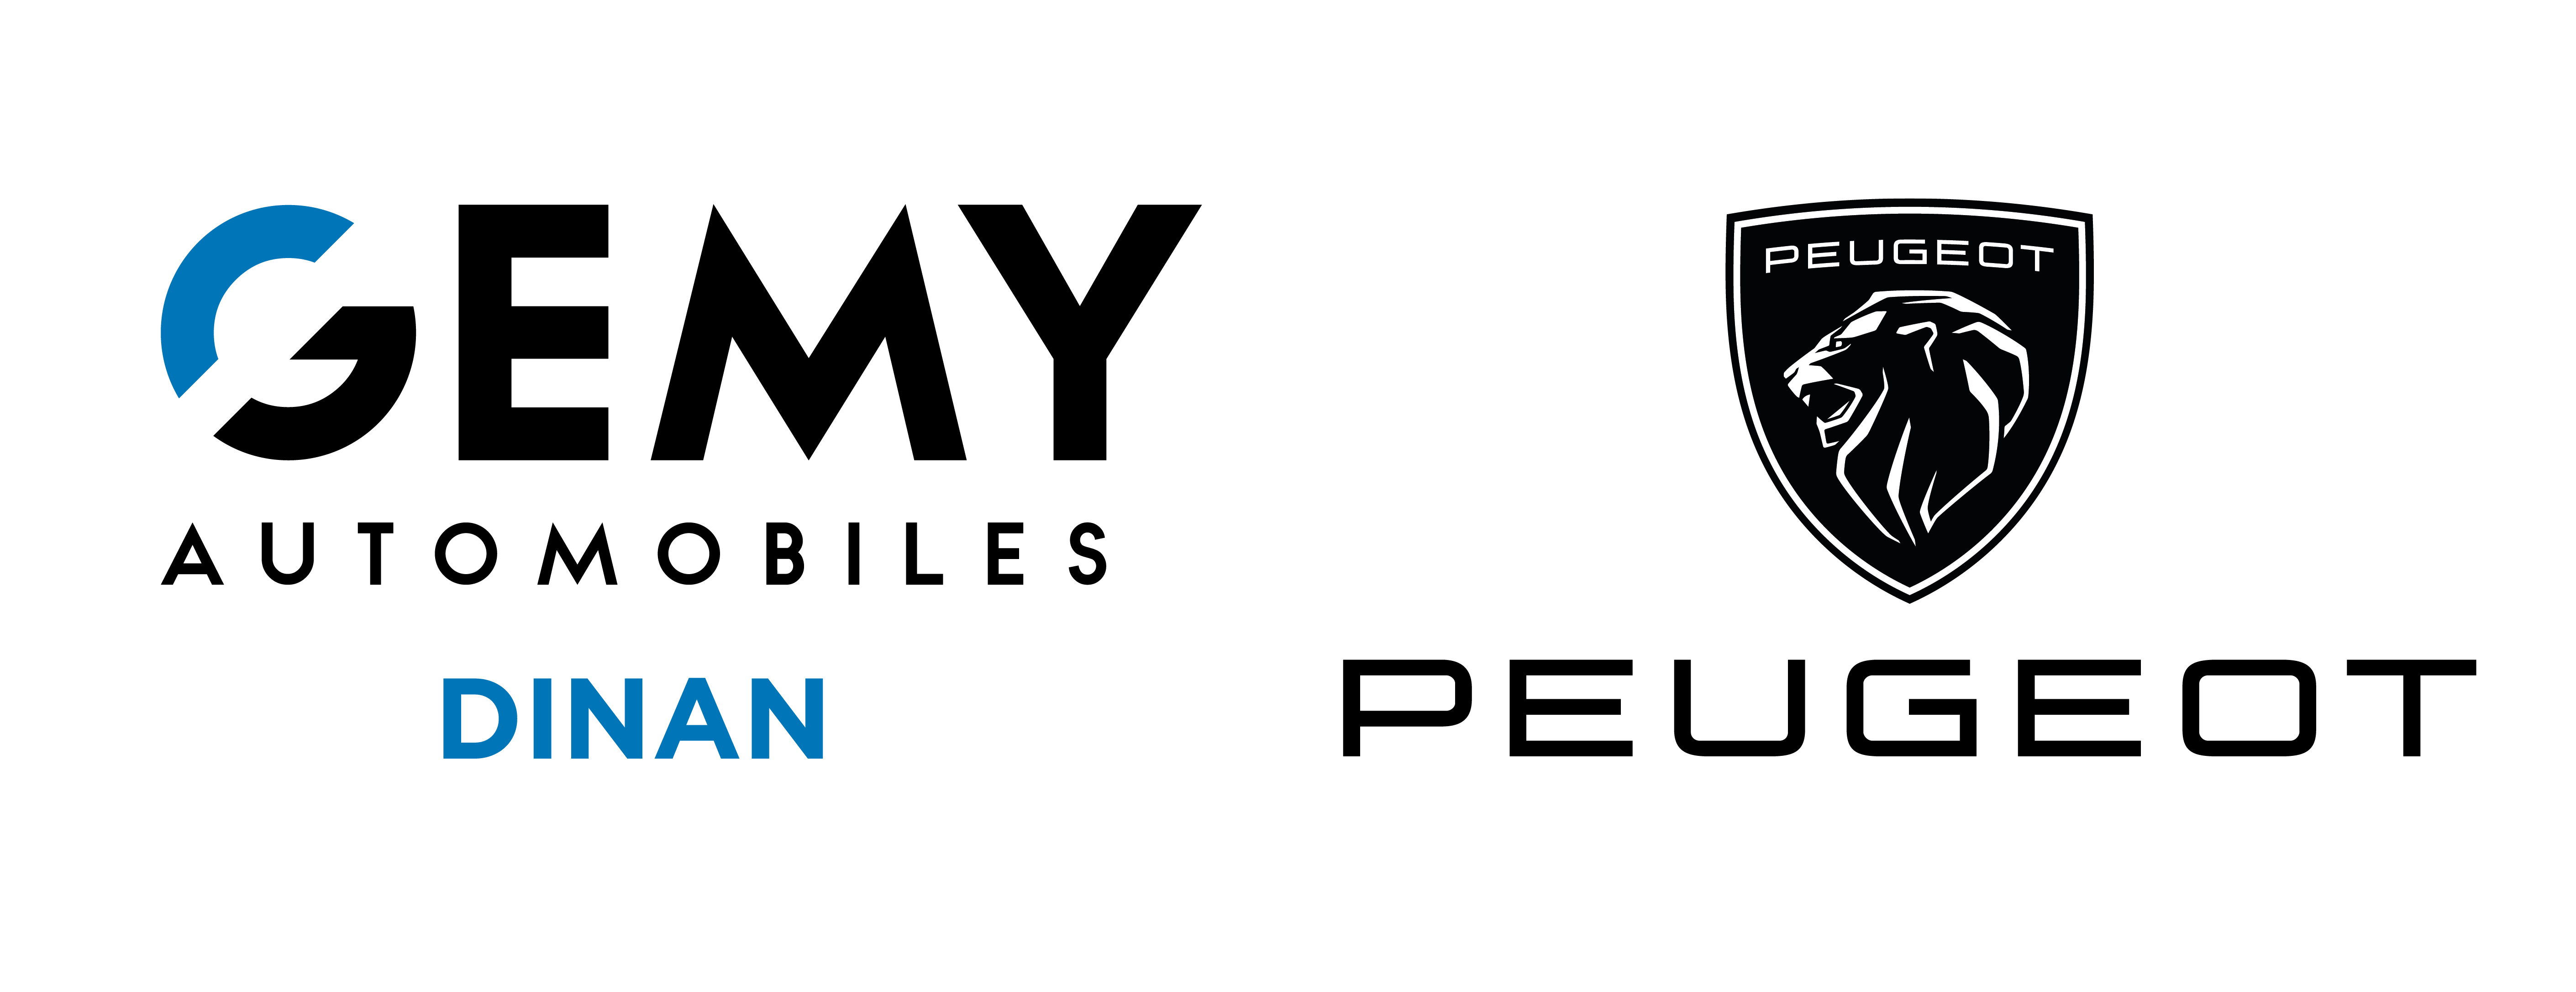 logo_gemy-dinan-peugeot_version_bloc_marque